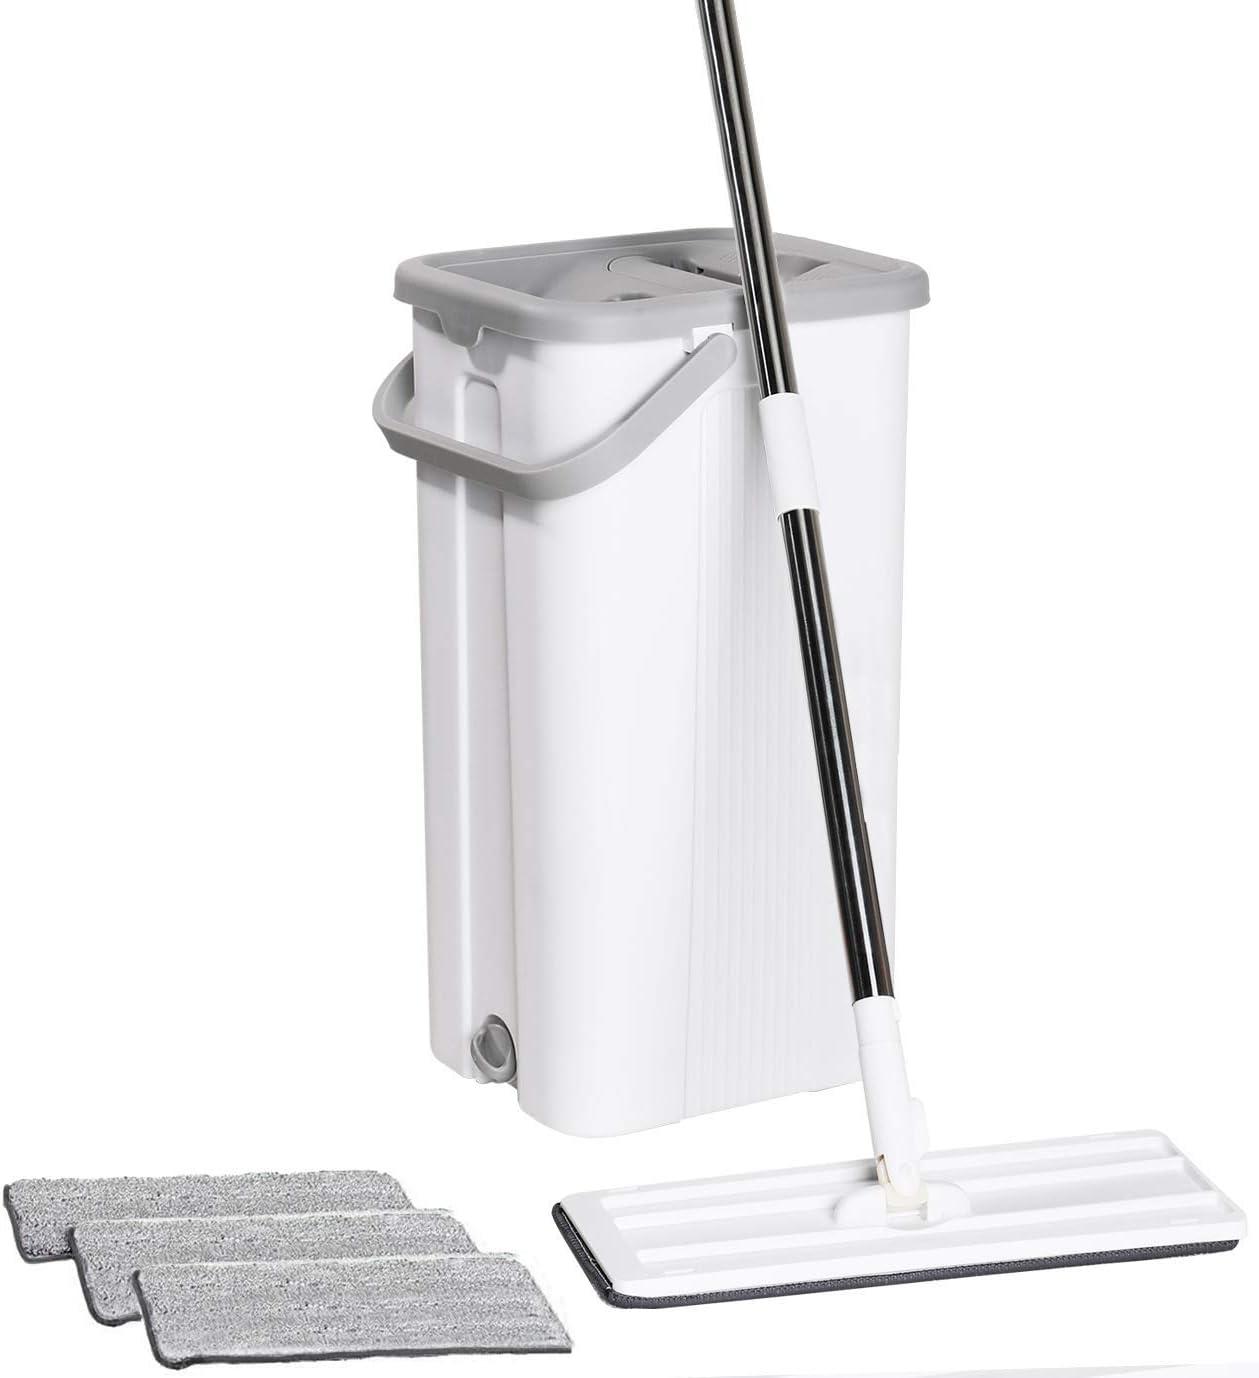 KTT Flat Floor Mop and Bucket Set for Home Floor Cleaning Hands Free Floor Flat Mop Stainless-Steel Handle 3 Reusable & Washable Microfiber Pads…